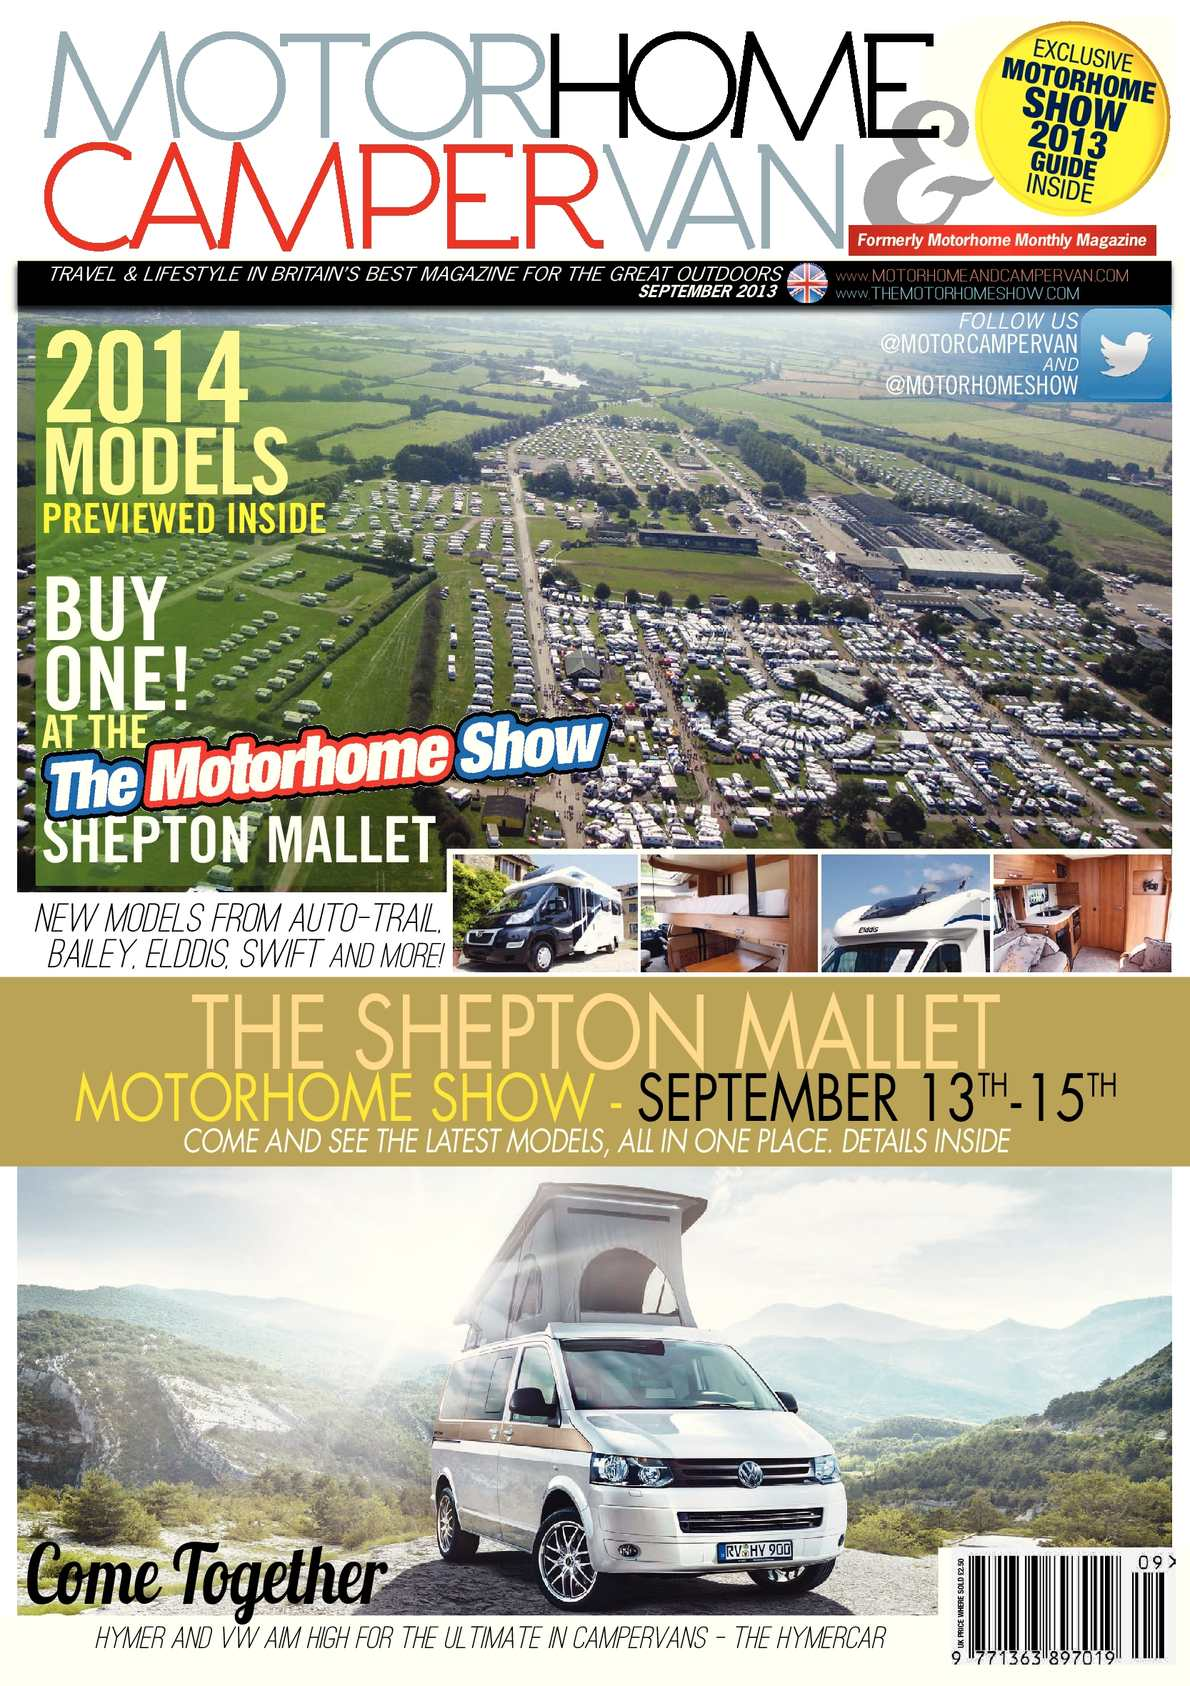 Calaméo Sept 2013 Motorhome & Campervan Magazine